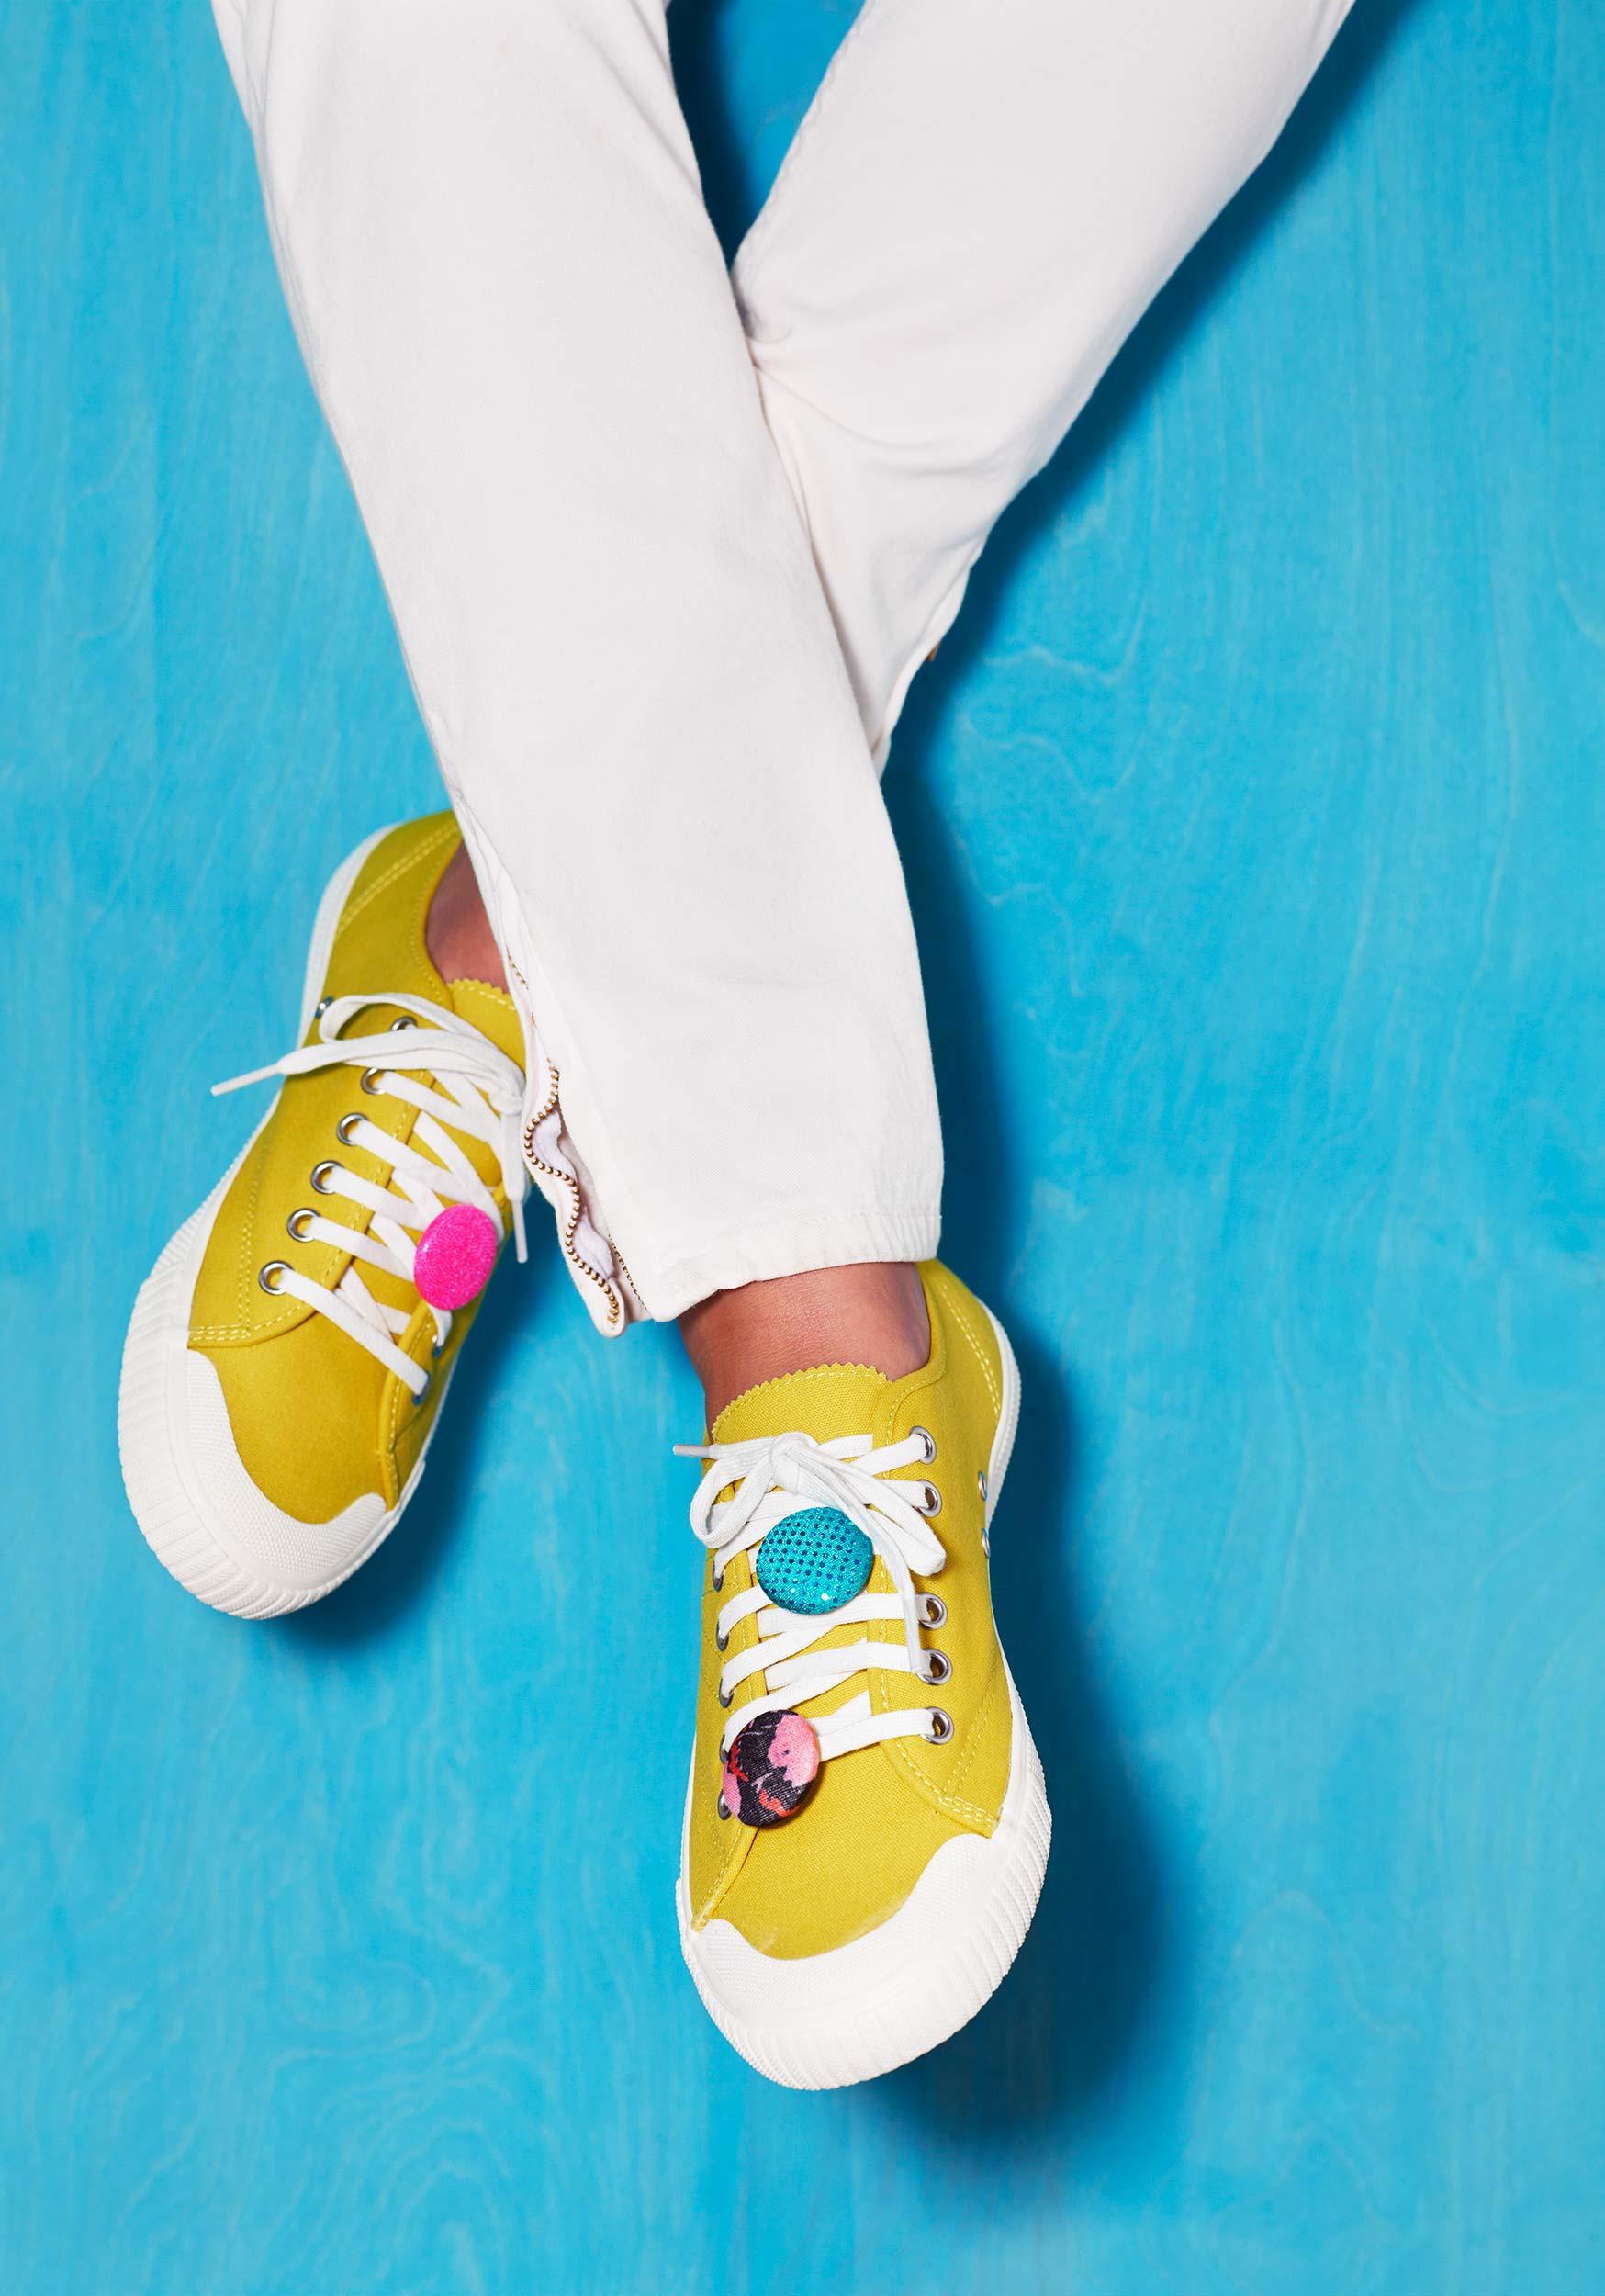 Shoes_0057.jpg